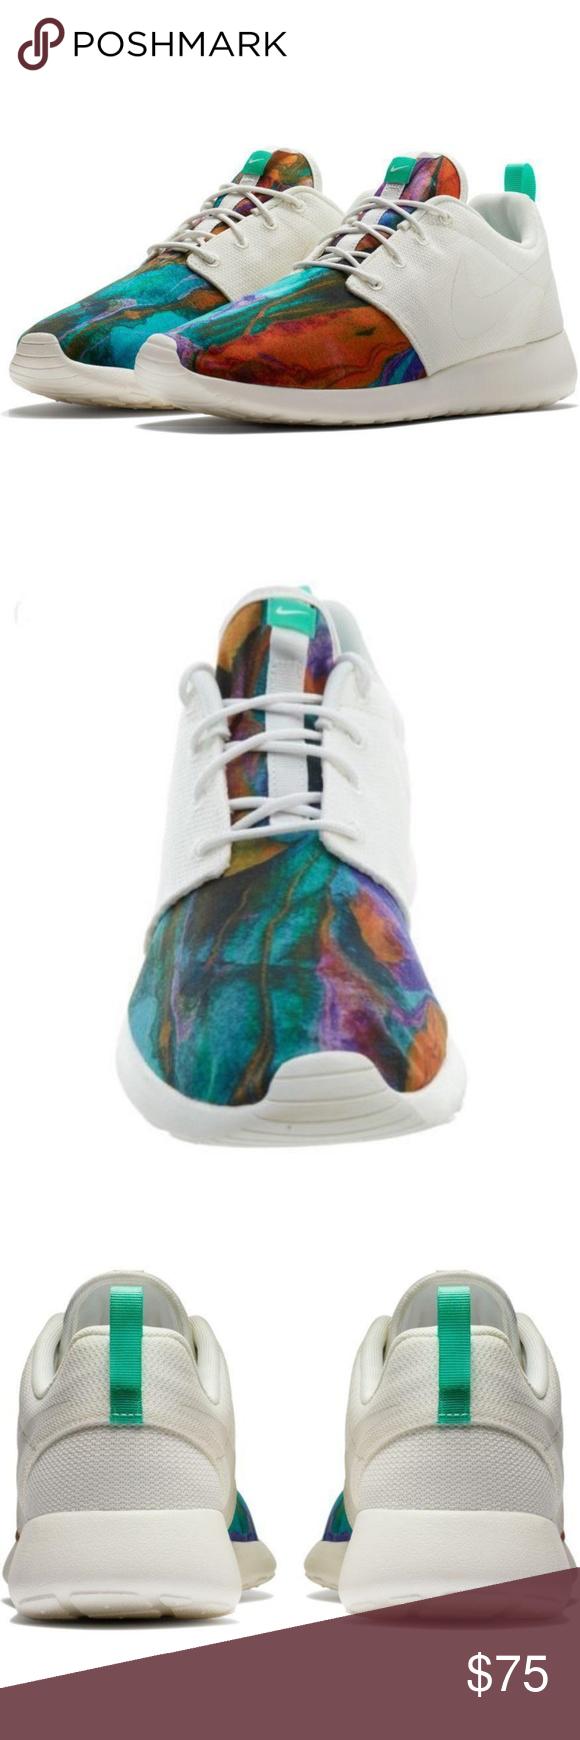 buy online f0475 0061e Nike Roshe One Print Mens Shoes Tye Dye Sail Ment New in Box Nike Roshe  One Print Mens Shoes Tye Dye Sail Menta Running Size 8.5 Nike Shoes  Athletic Shoes